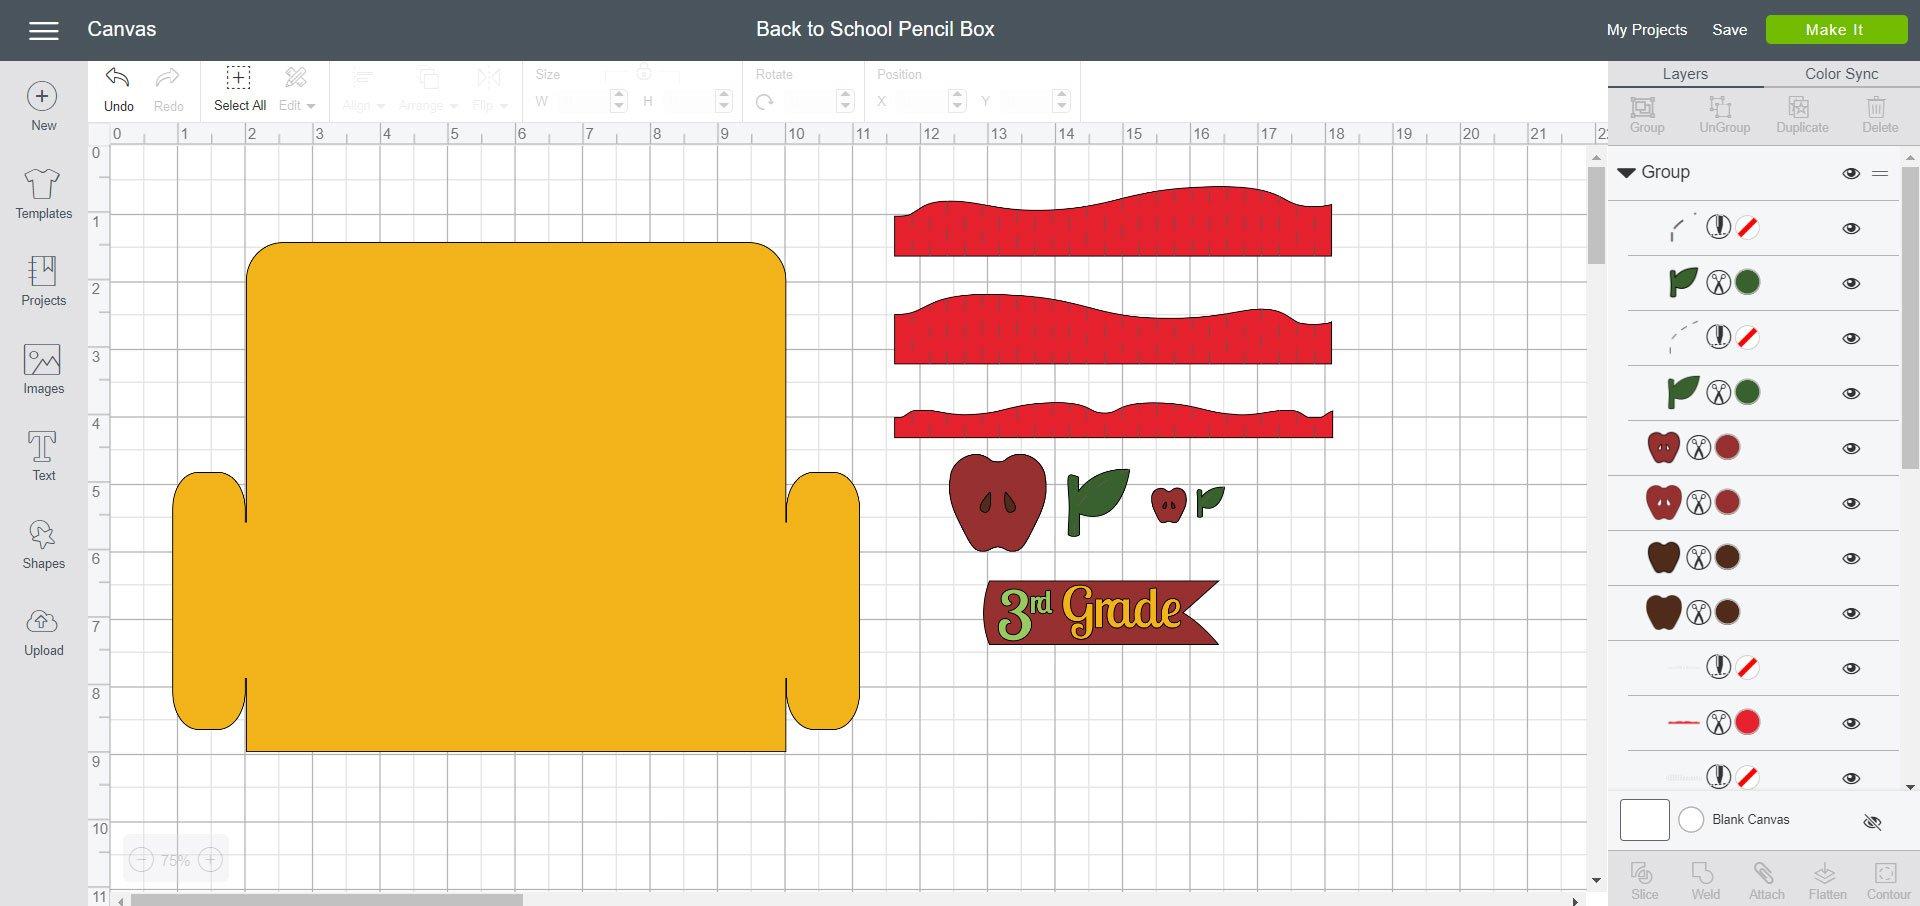 Back to School Pencil Box